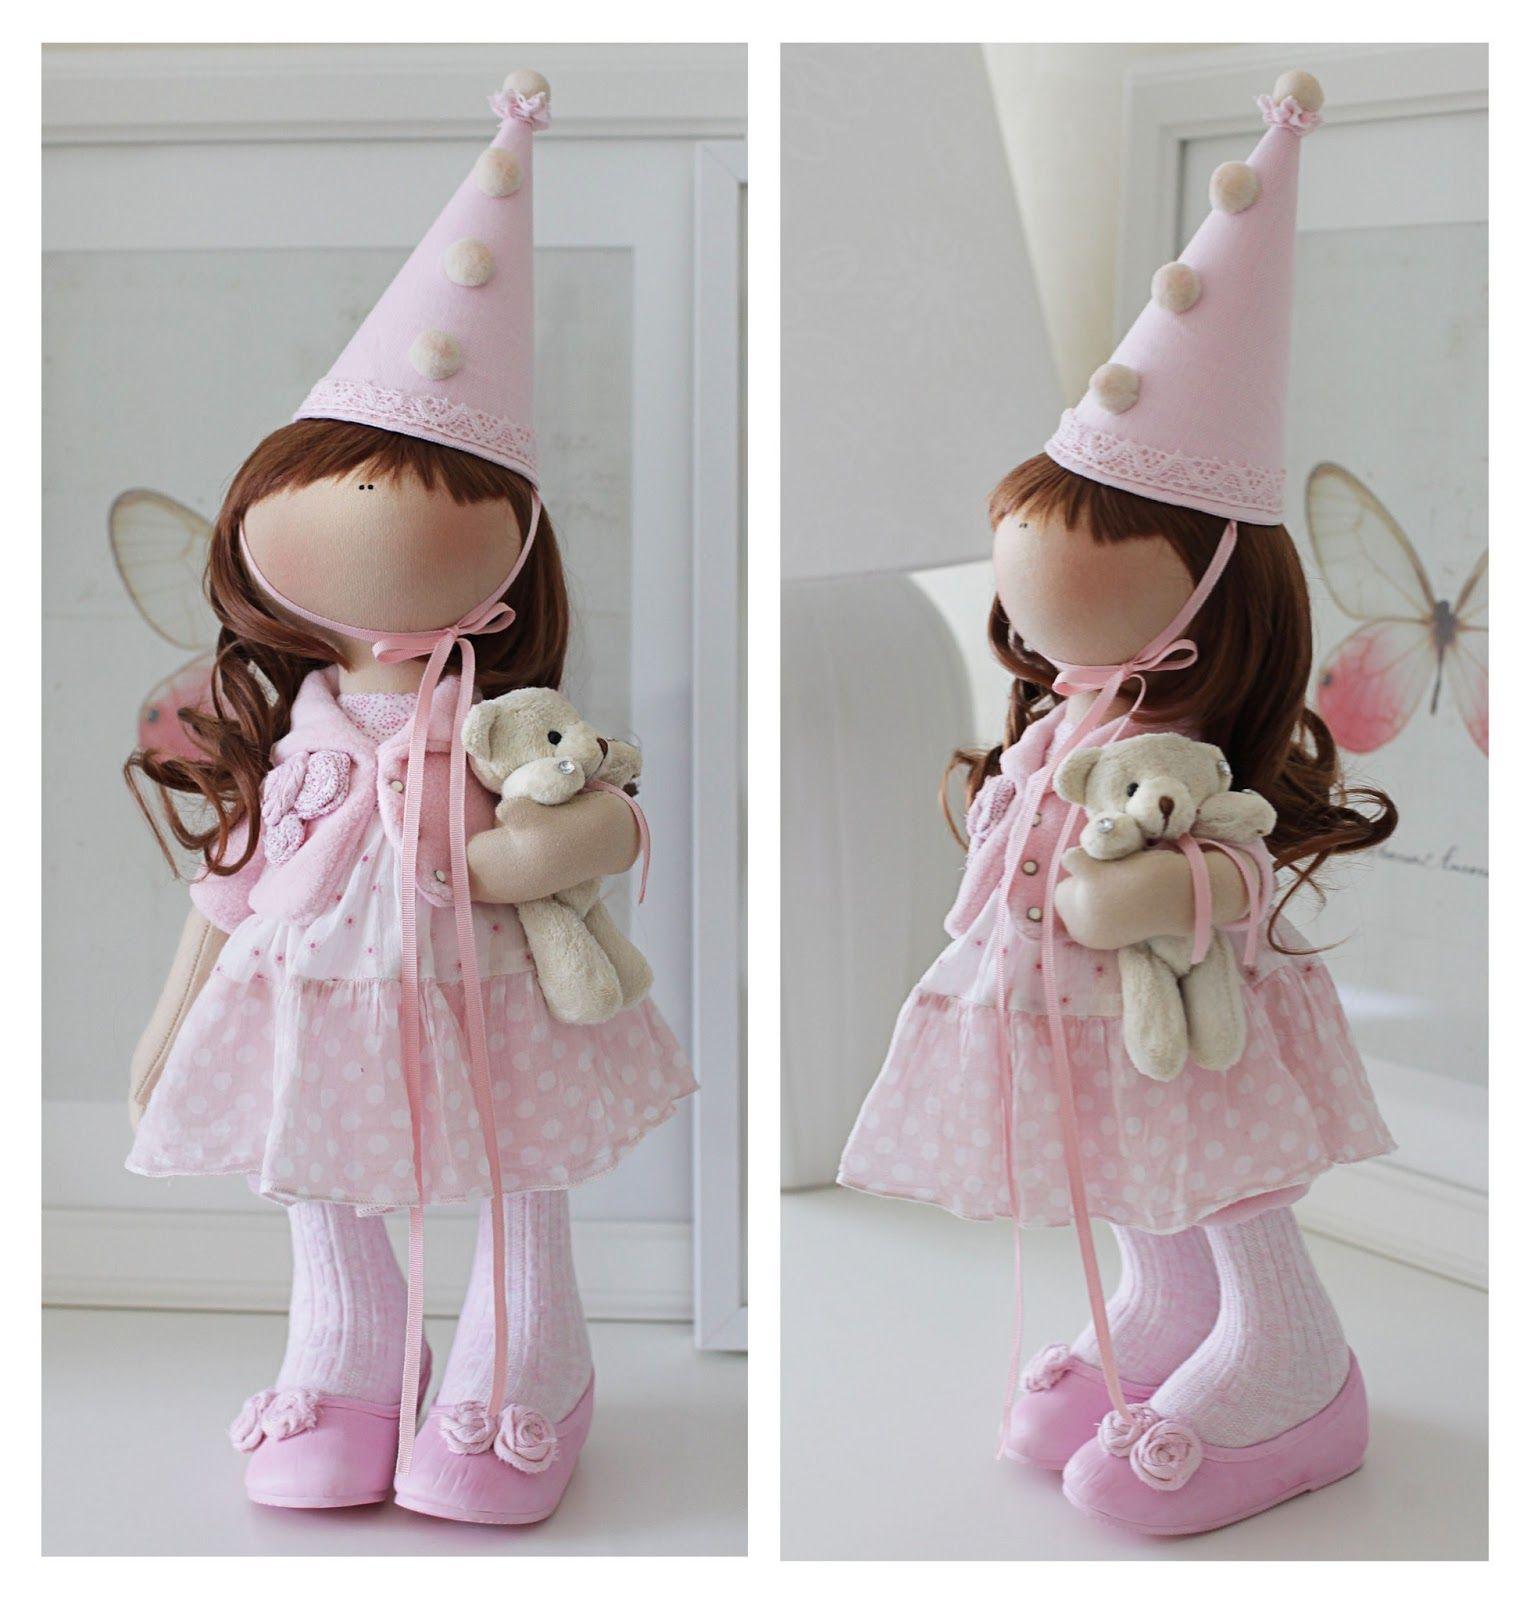 Фотообои куклы широкоформатные соцсетях